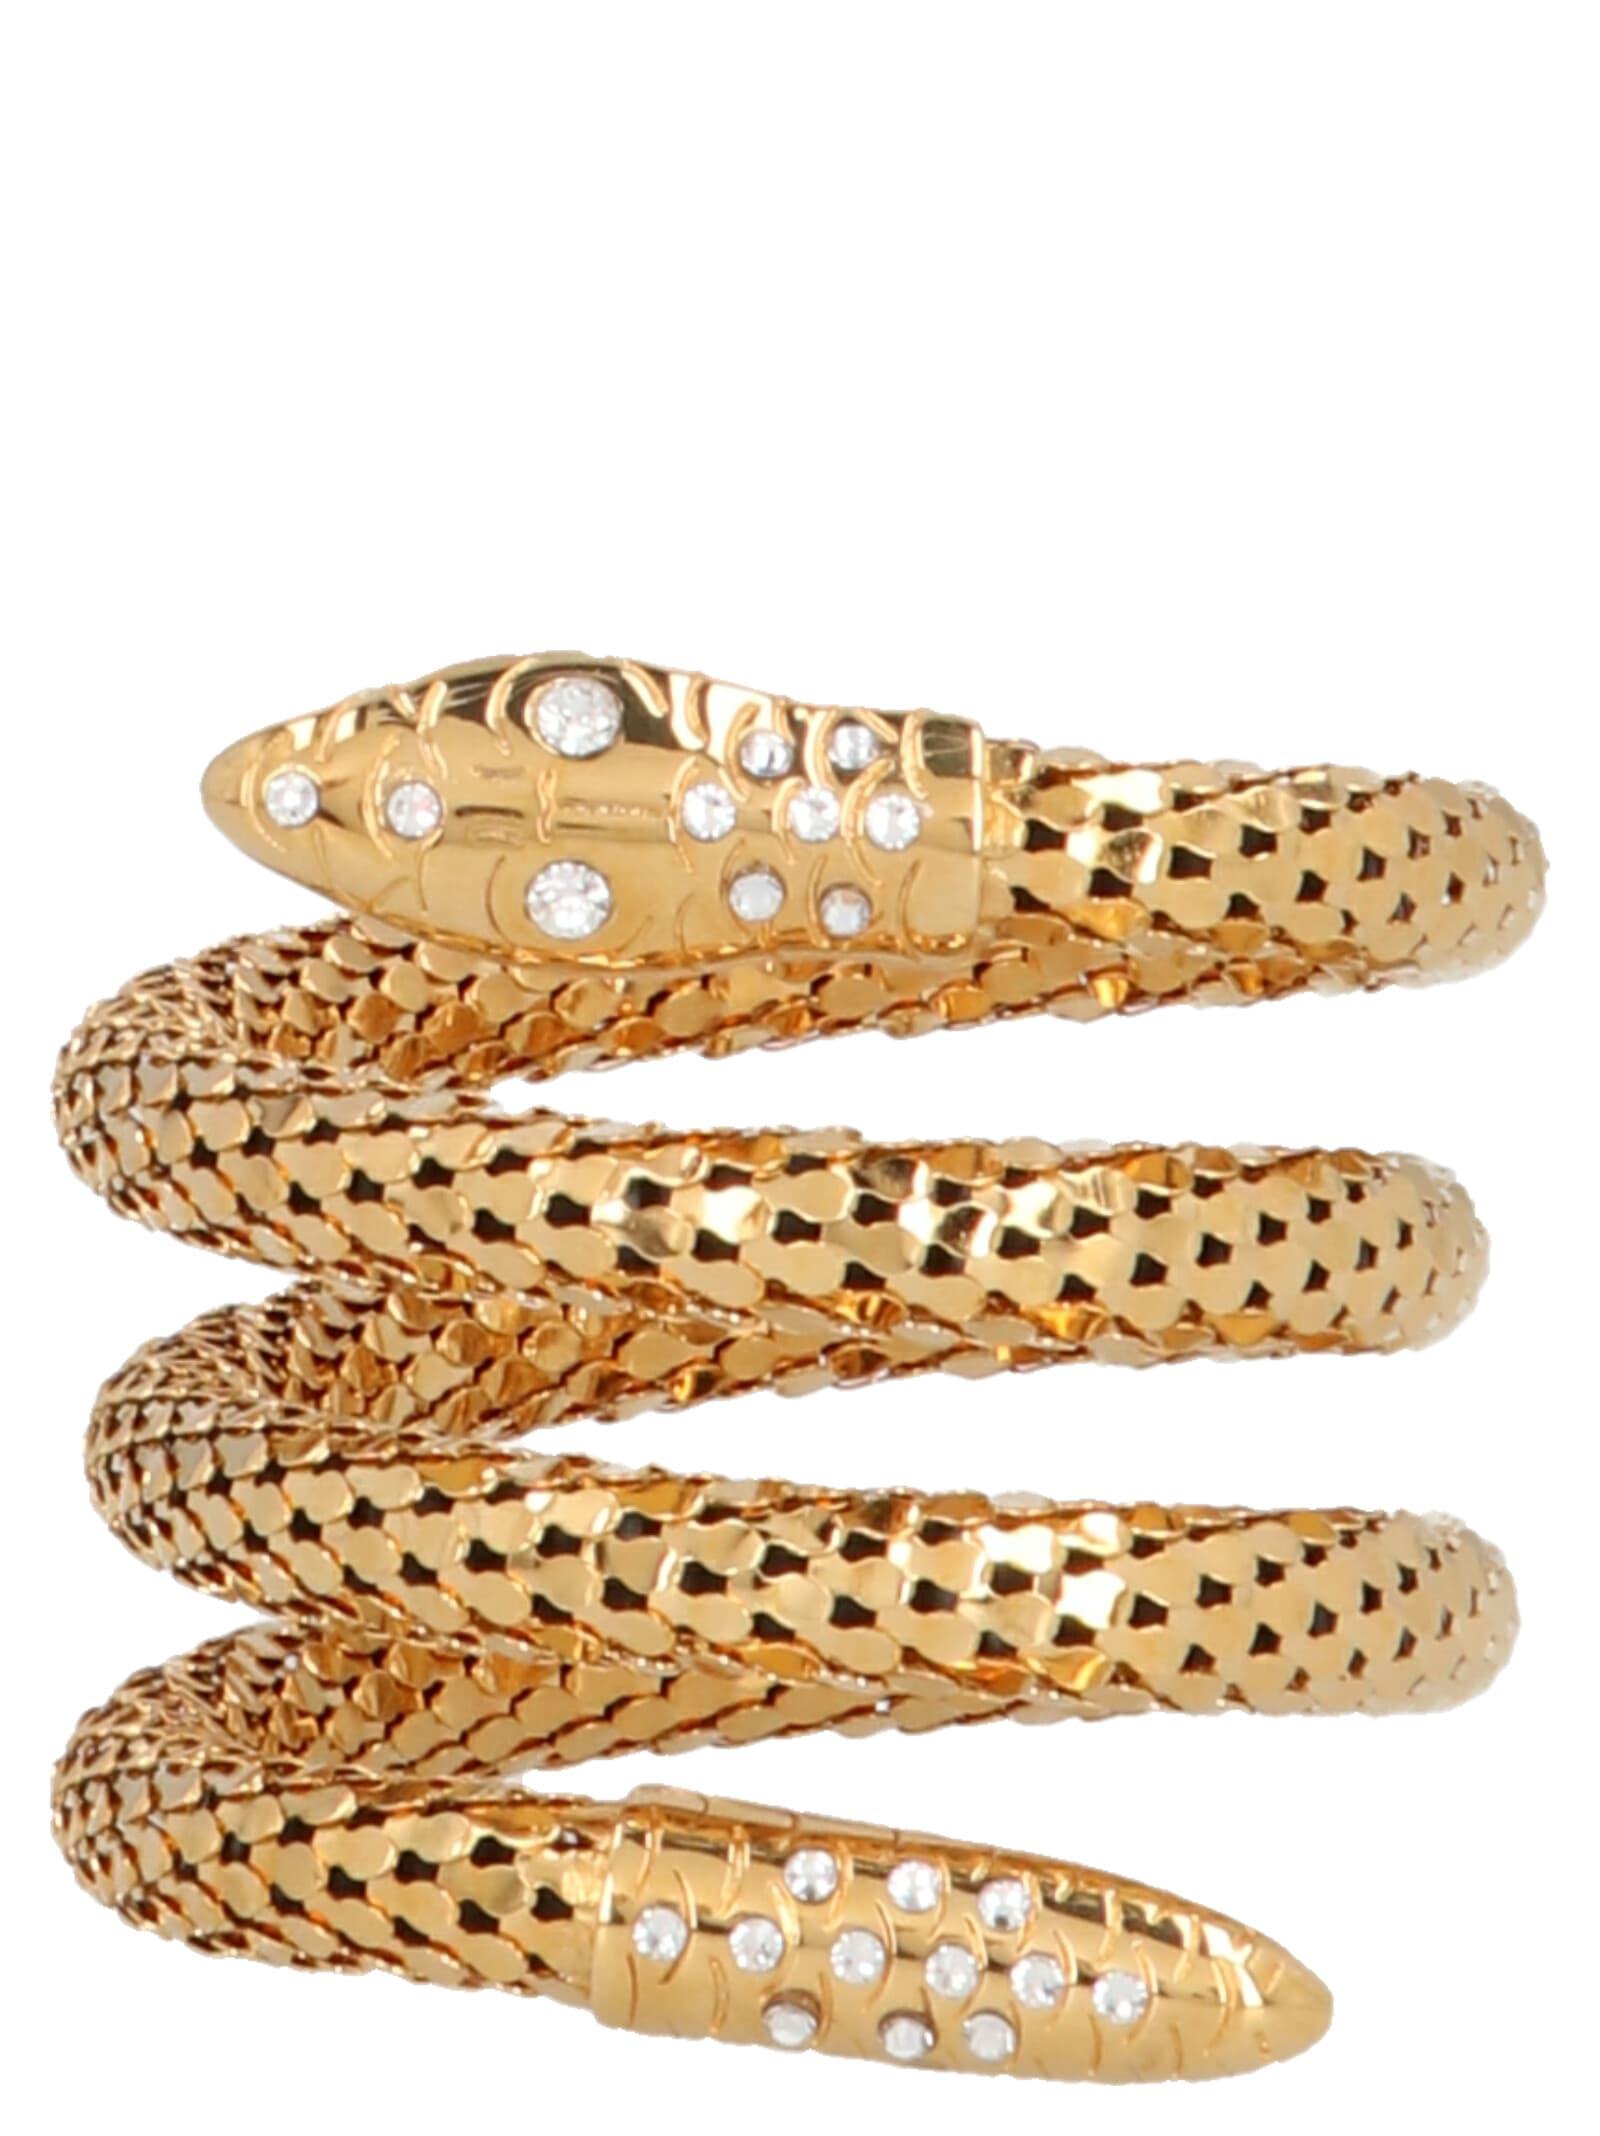 Giuseppe Zanotti velenoso Bracelet And Anklet